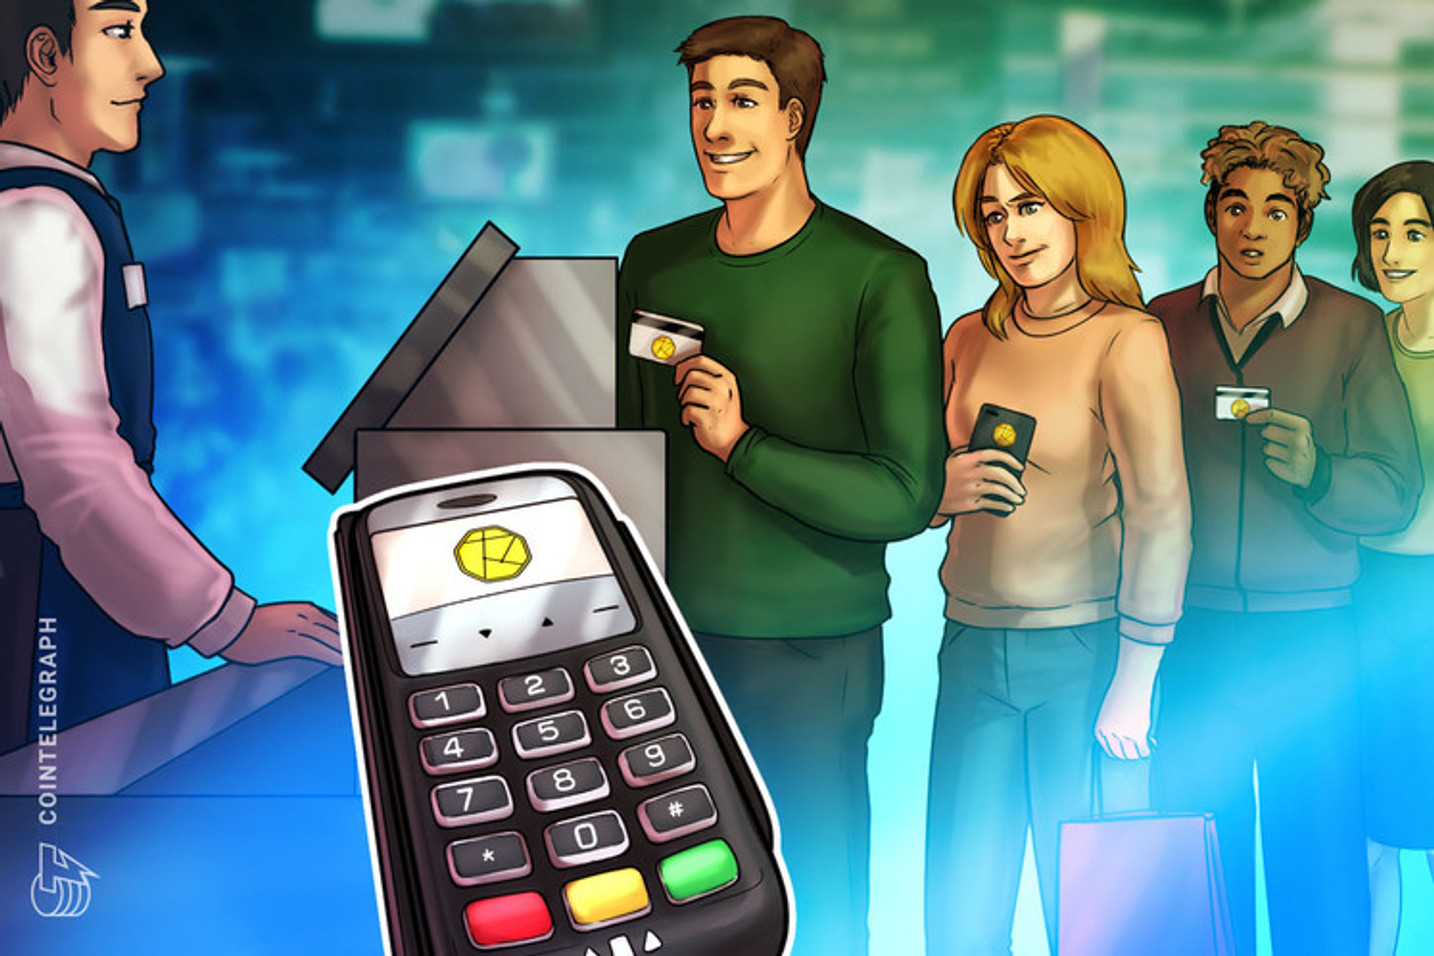 Laboratorio farmacéutico de España comenzará a aceptar pagos en criptomonedas